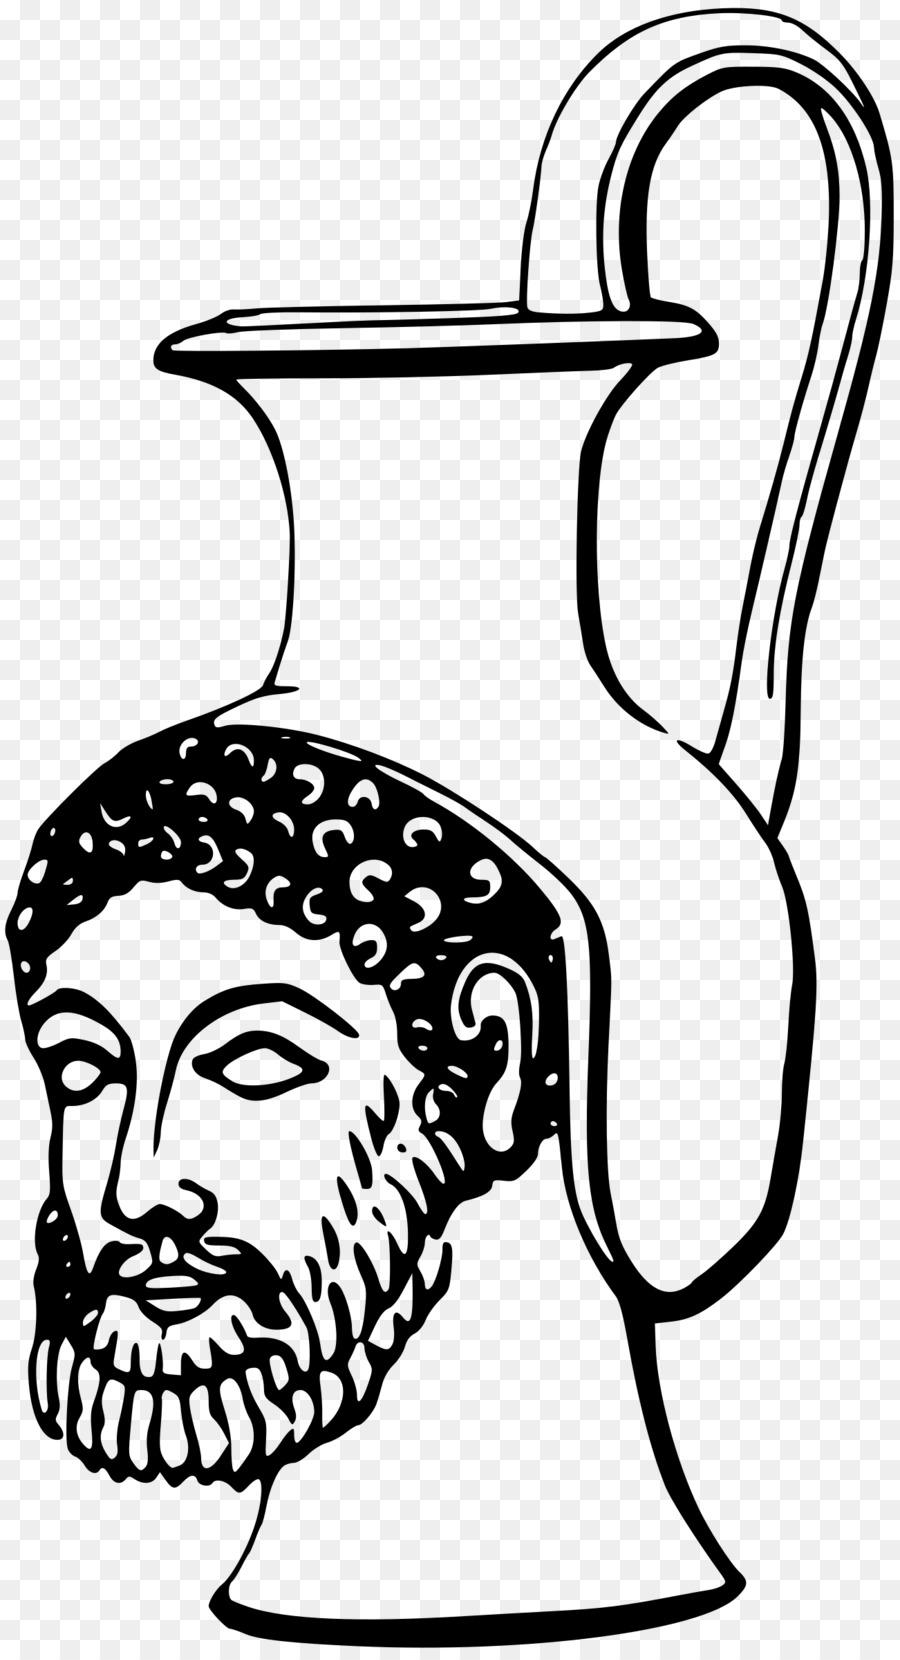 Greece clipart line. Cartoon face head font